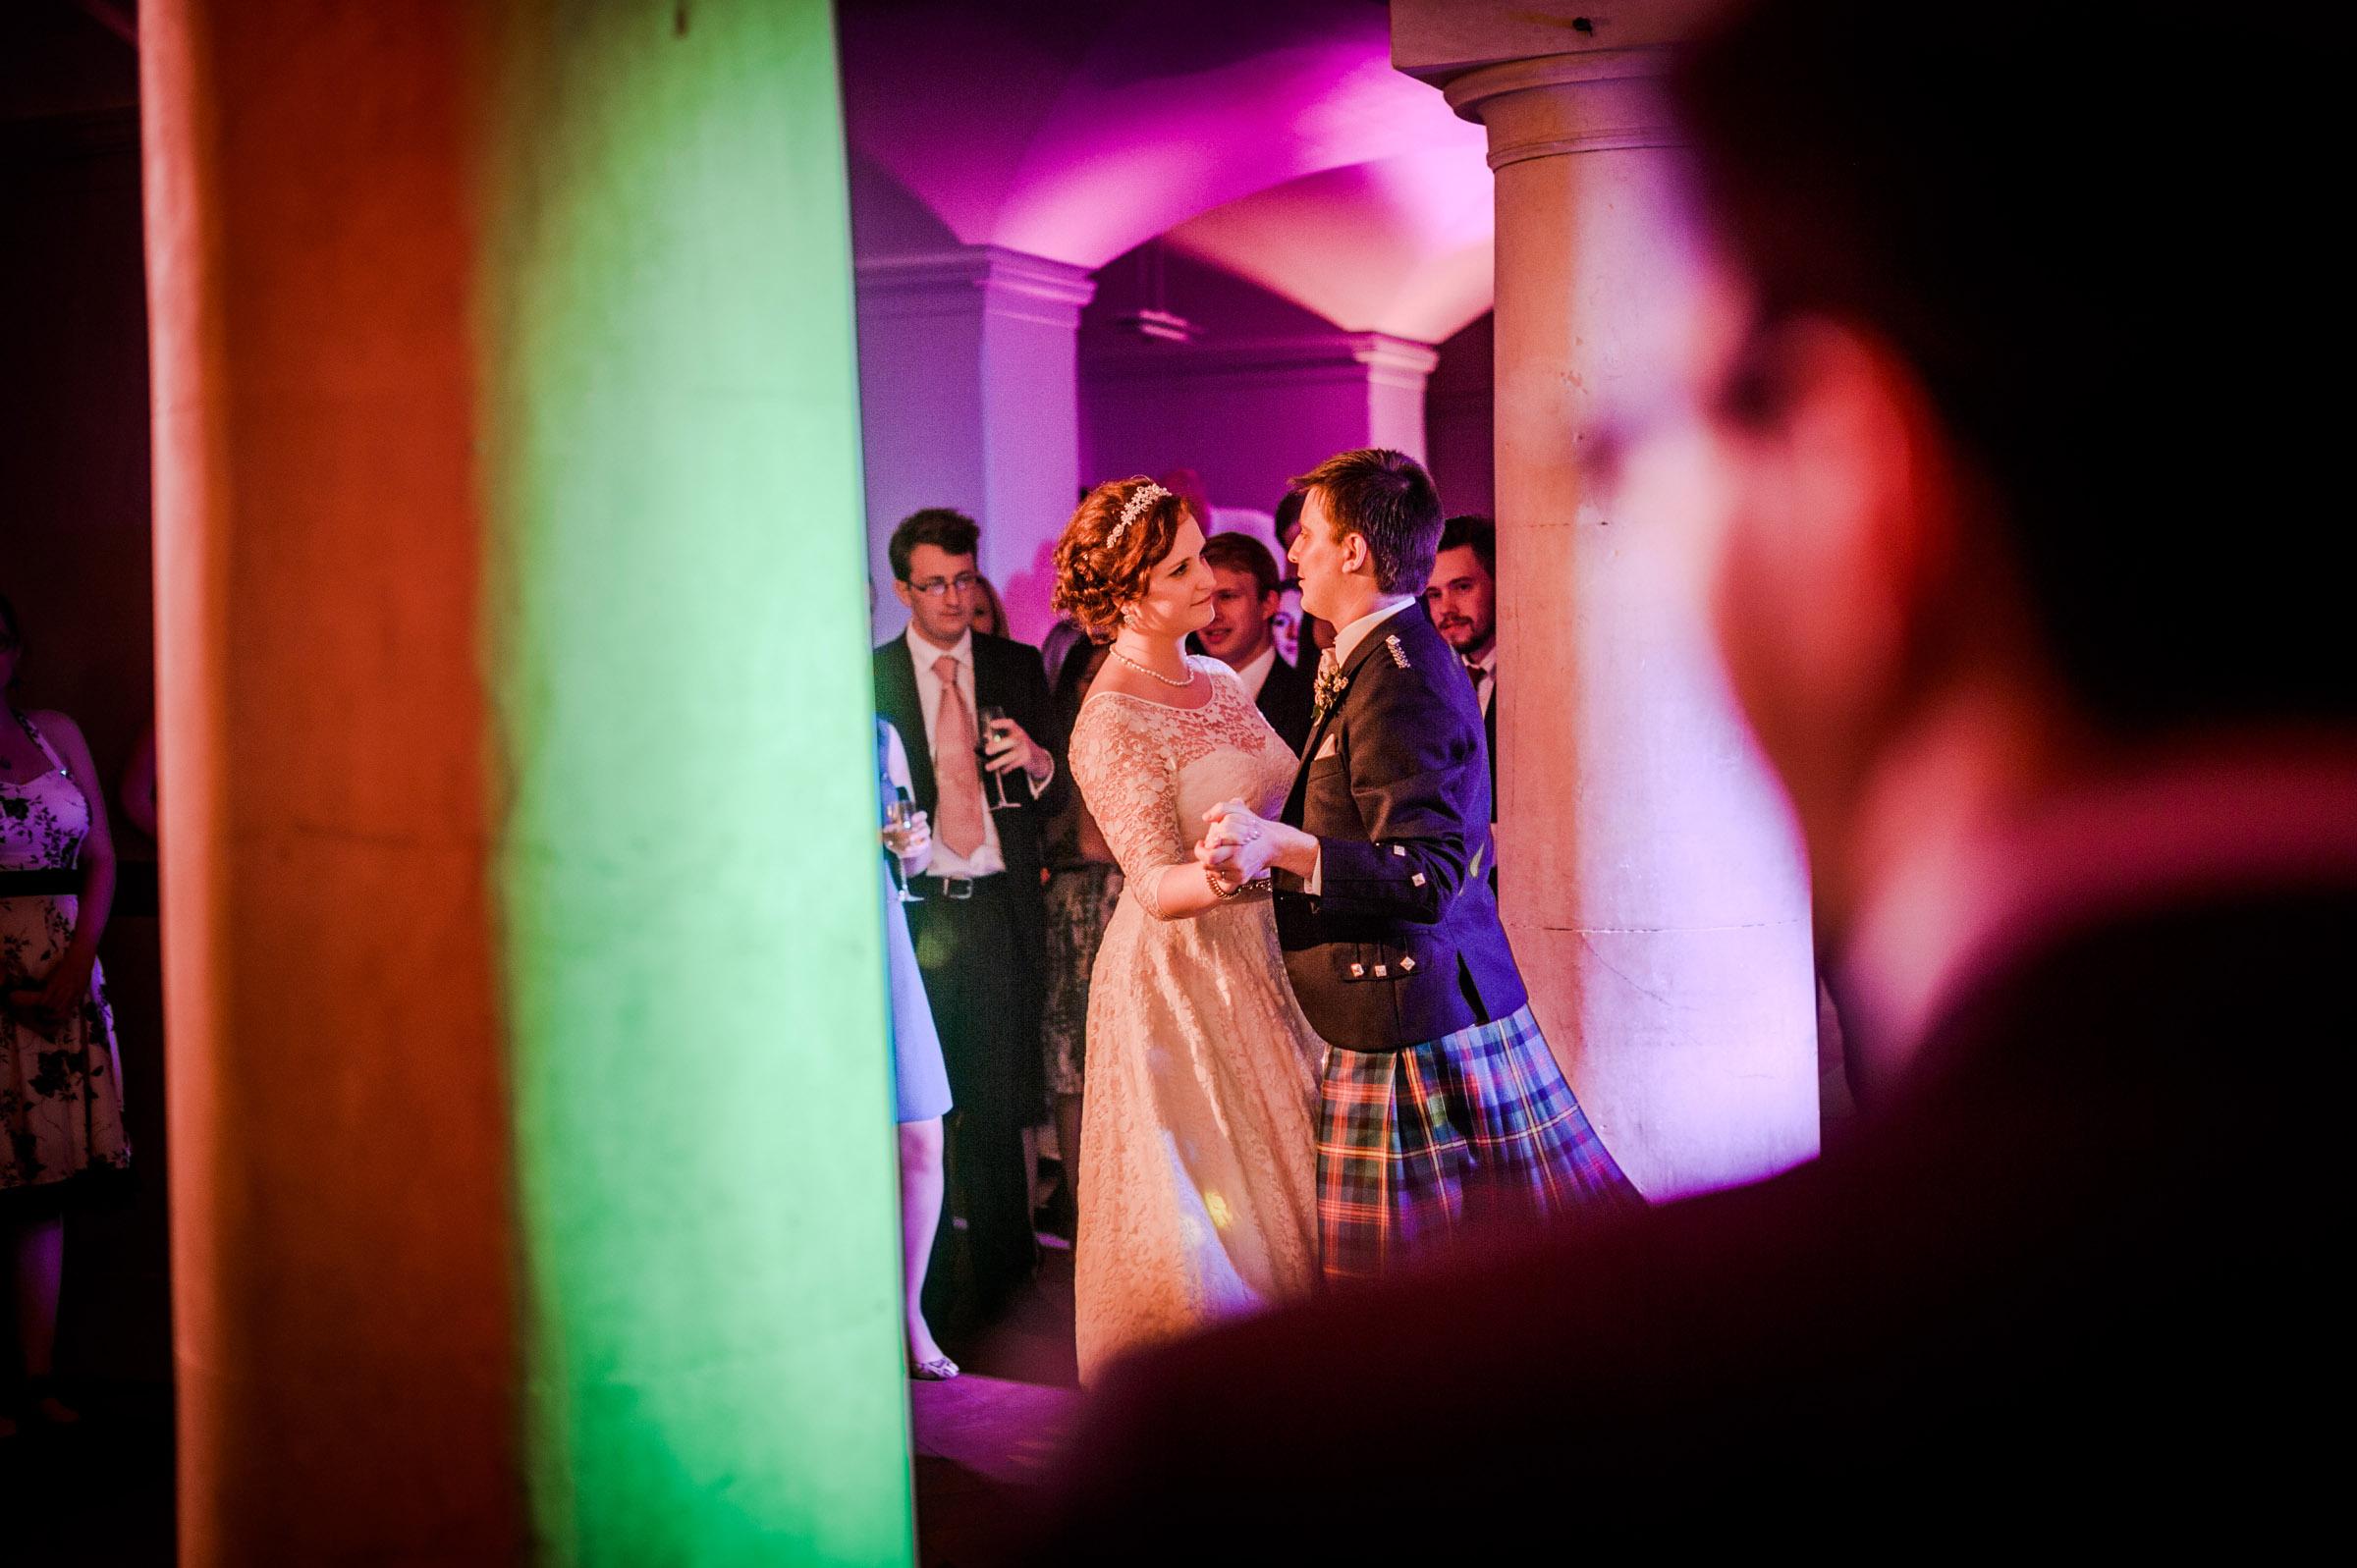 Ashmolean-Museum-Wedding-Pictures-0071.jpg